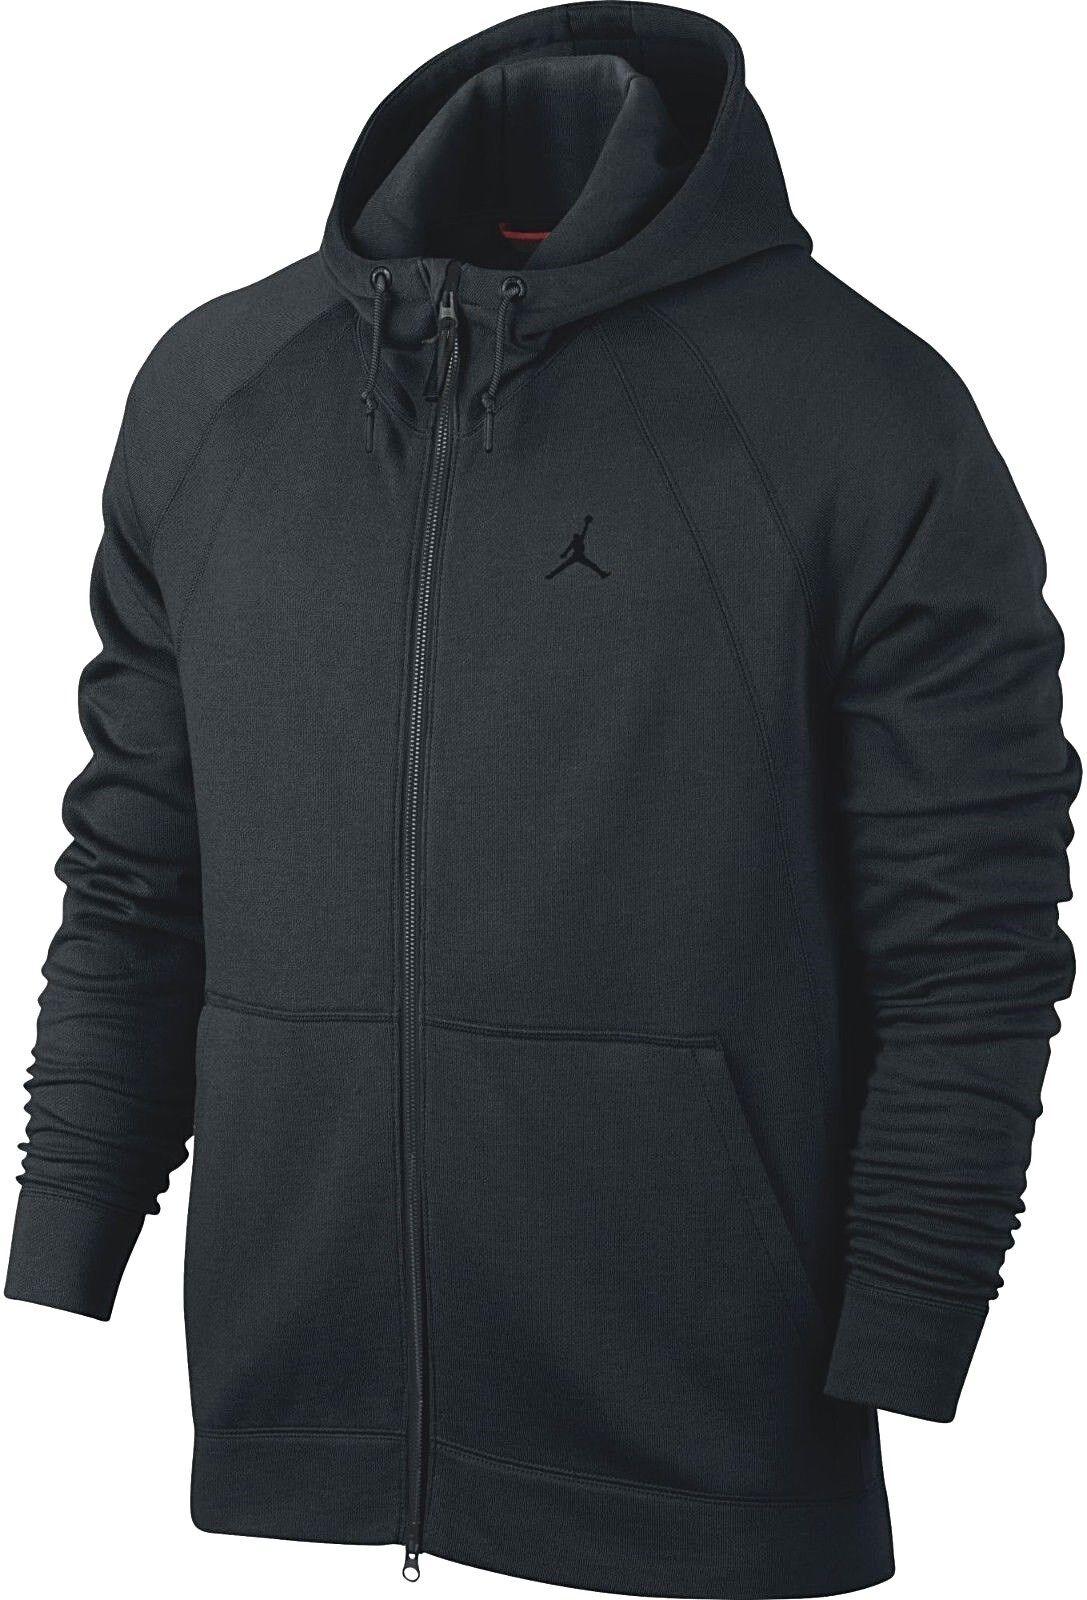 Original Nike Jordan Wings Fleece Reißverschluss Schwarzer Kapuzenpullover